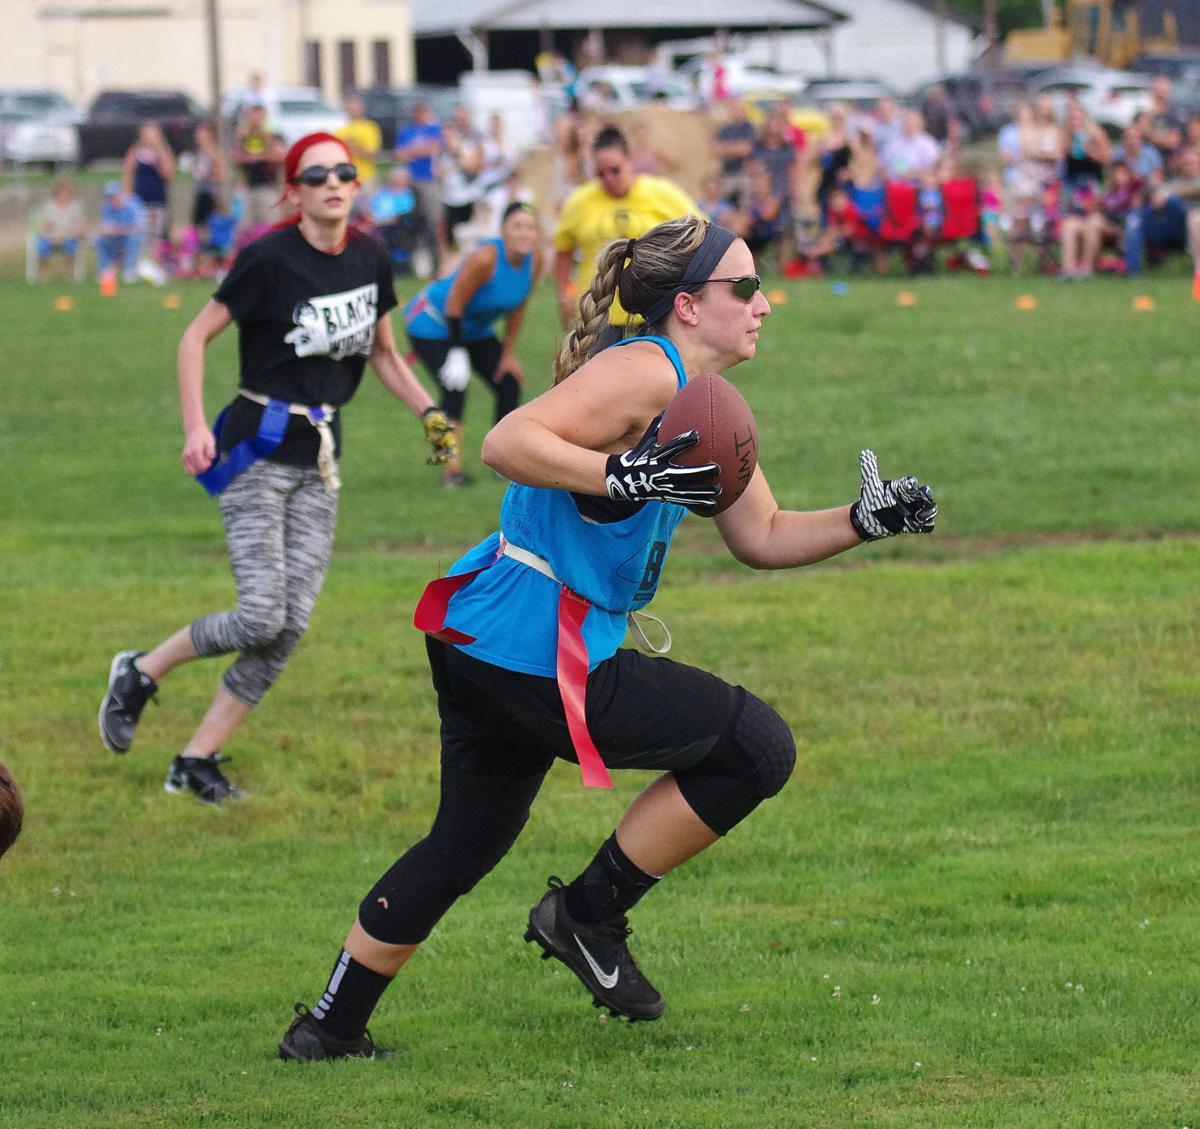 Ballers claim Indiana Women's Flag Football League title